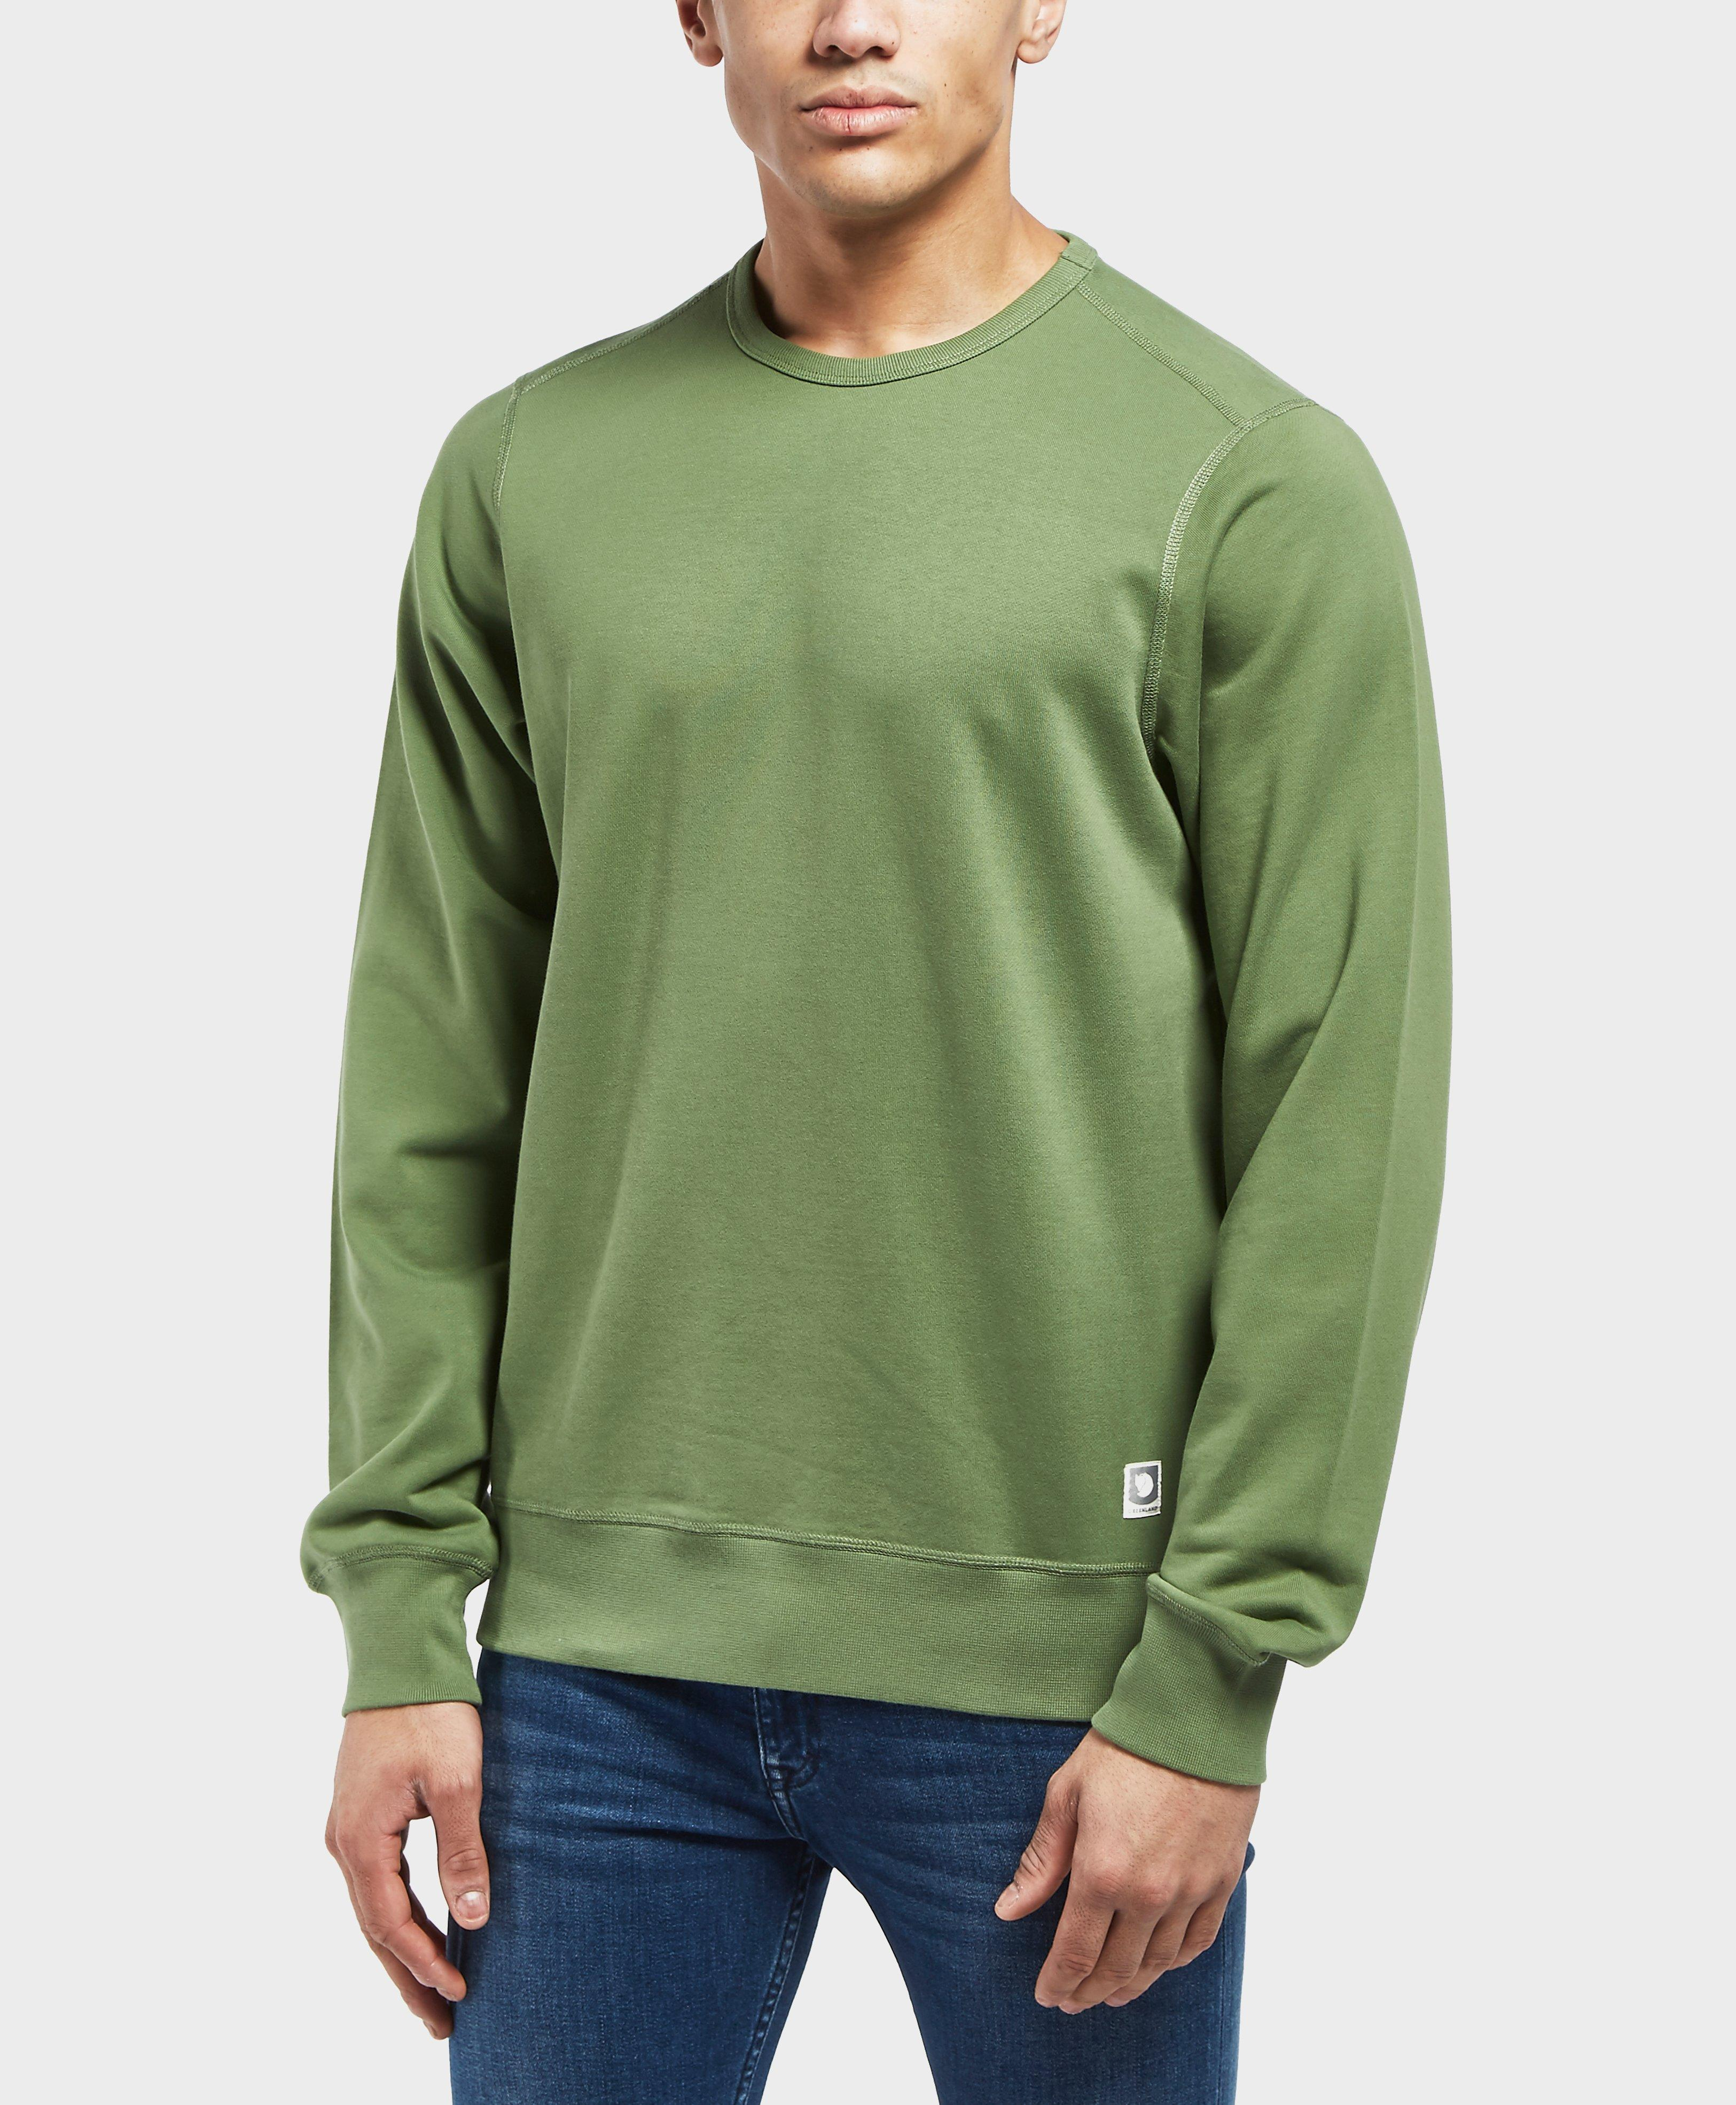 7aed034fe Fjallraven Greenland Crew Sweatshirt in Green for Men - Lyst